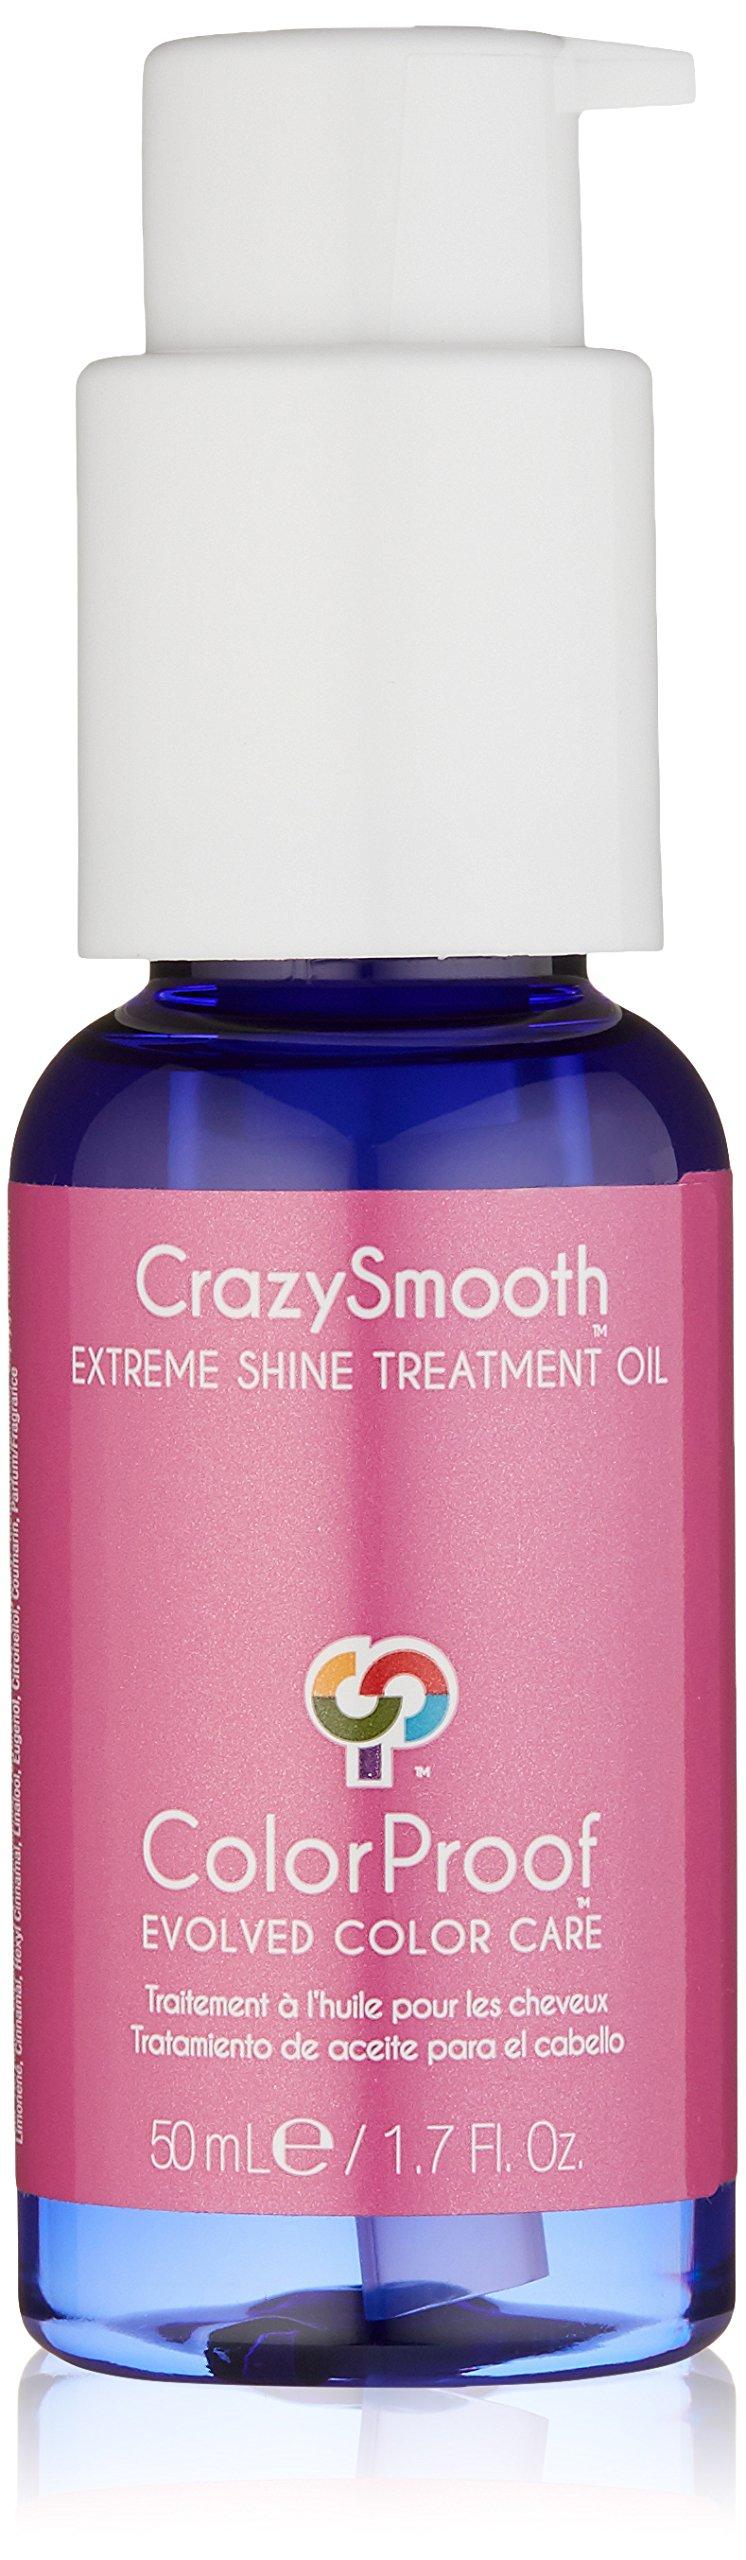 ColorProof Evolved Color Care Crazysmooth Extreme Shine Treatment Oil, 1.7 Fl Oz